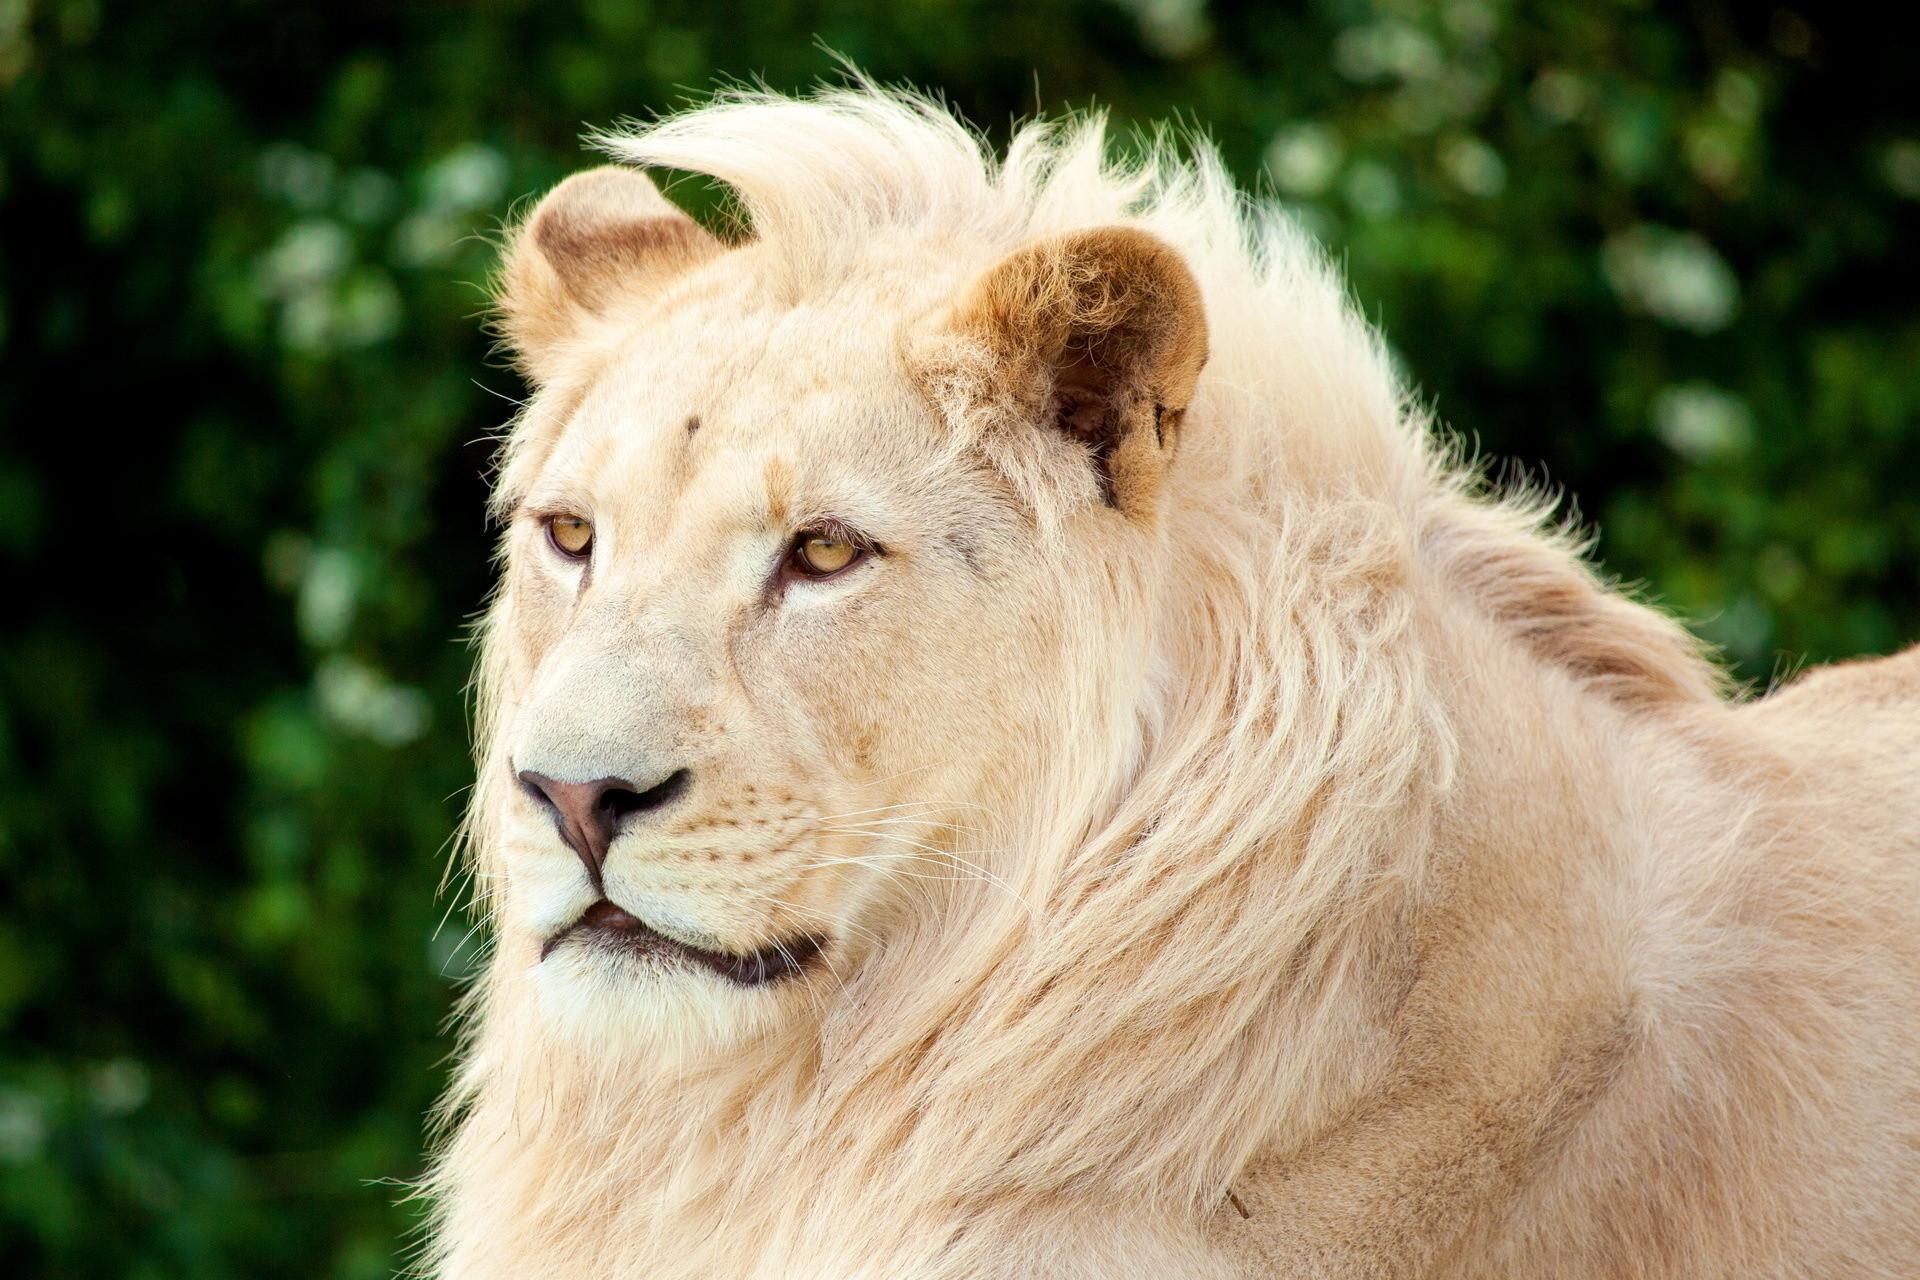 White Lion Closeup Wallpaper – White Lion Face Closeup